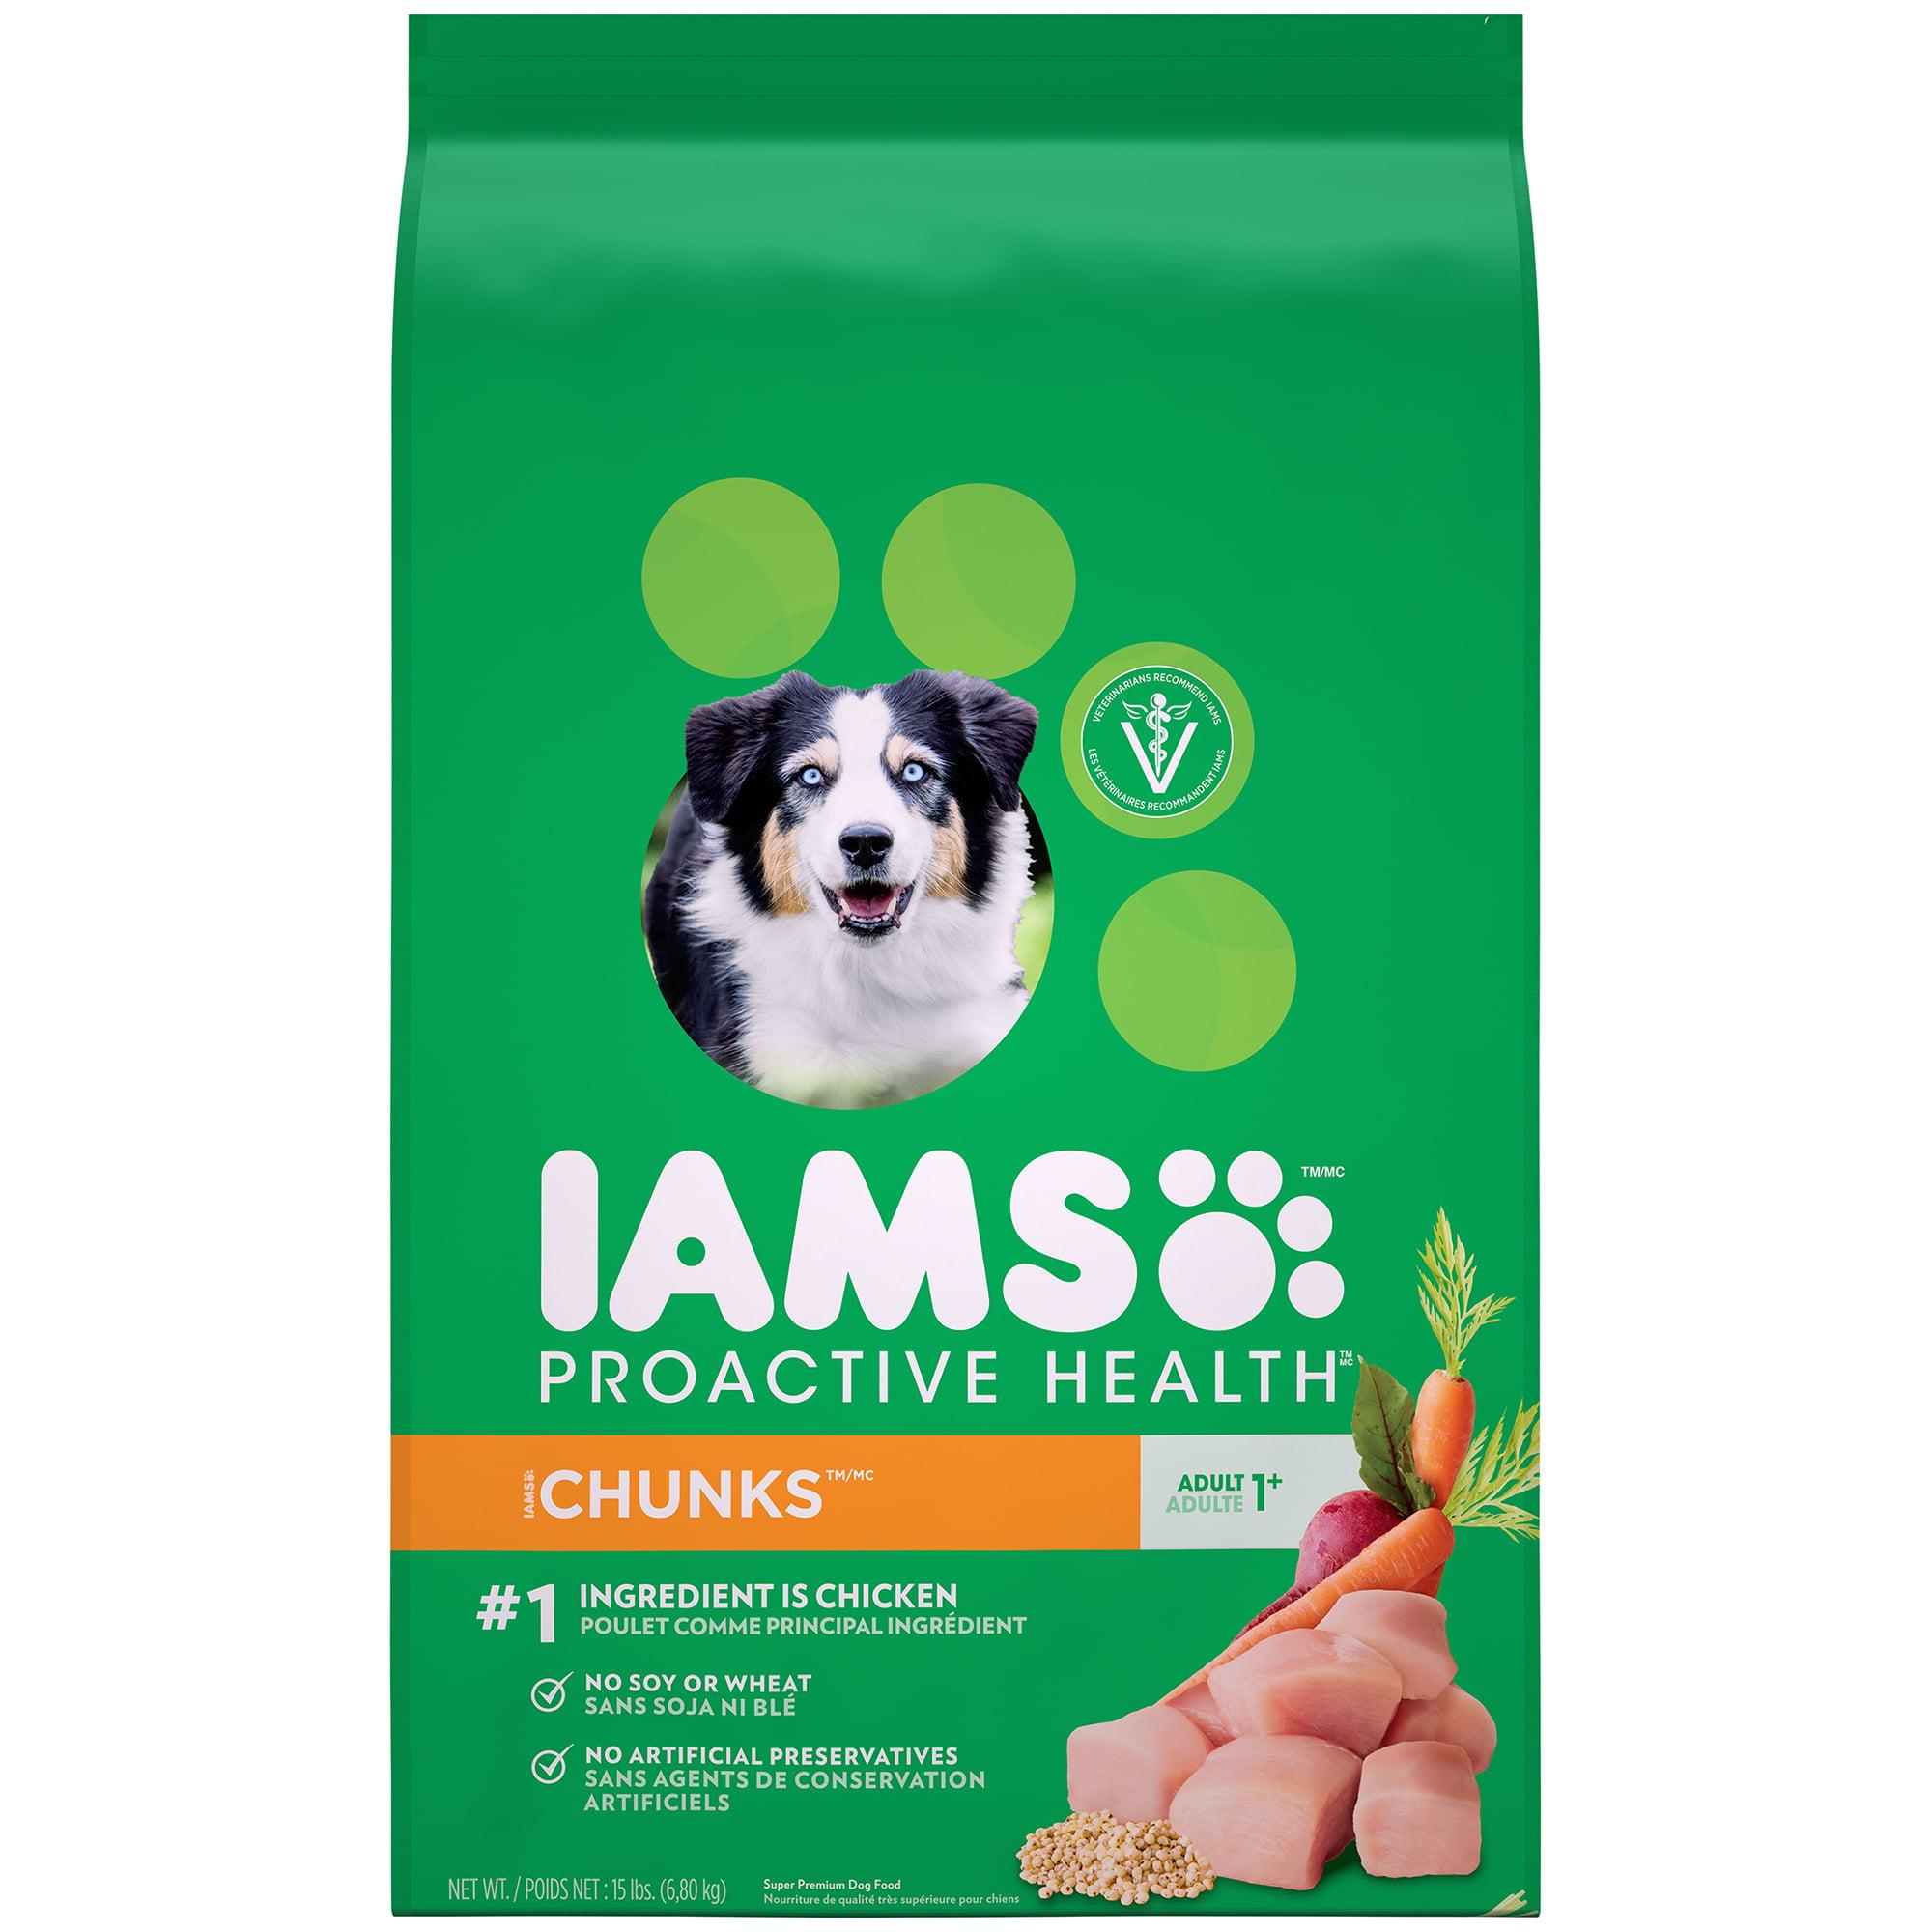 IAMS PROACTIVE HEALTH Adult Chunks Dry Dog Food 15 Pounds by Mars Petcare